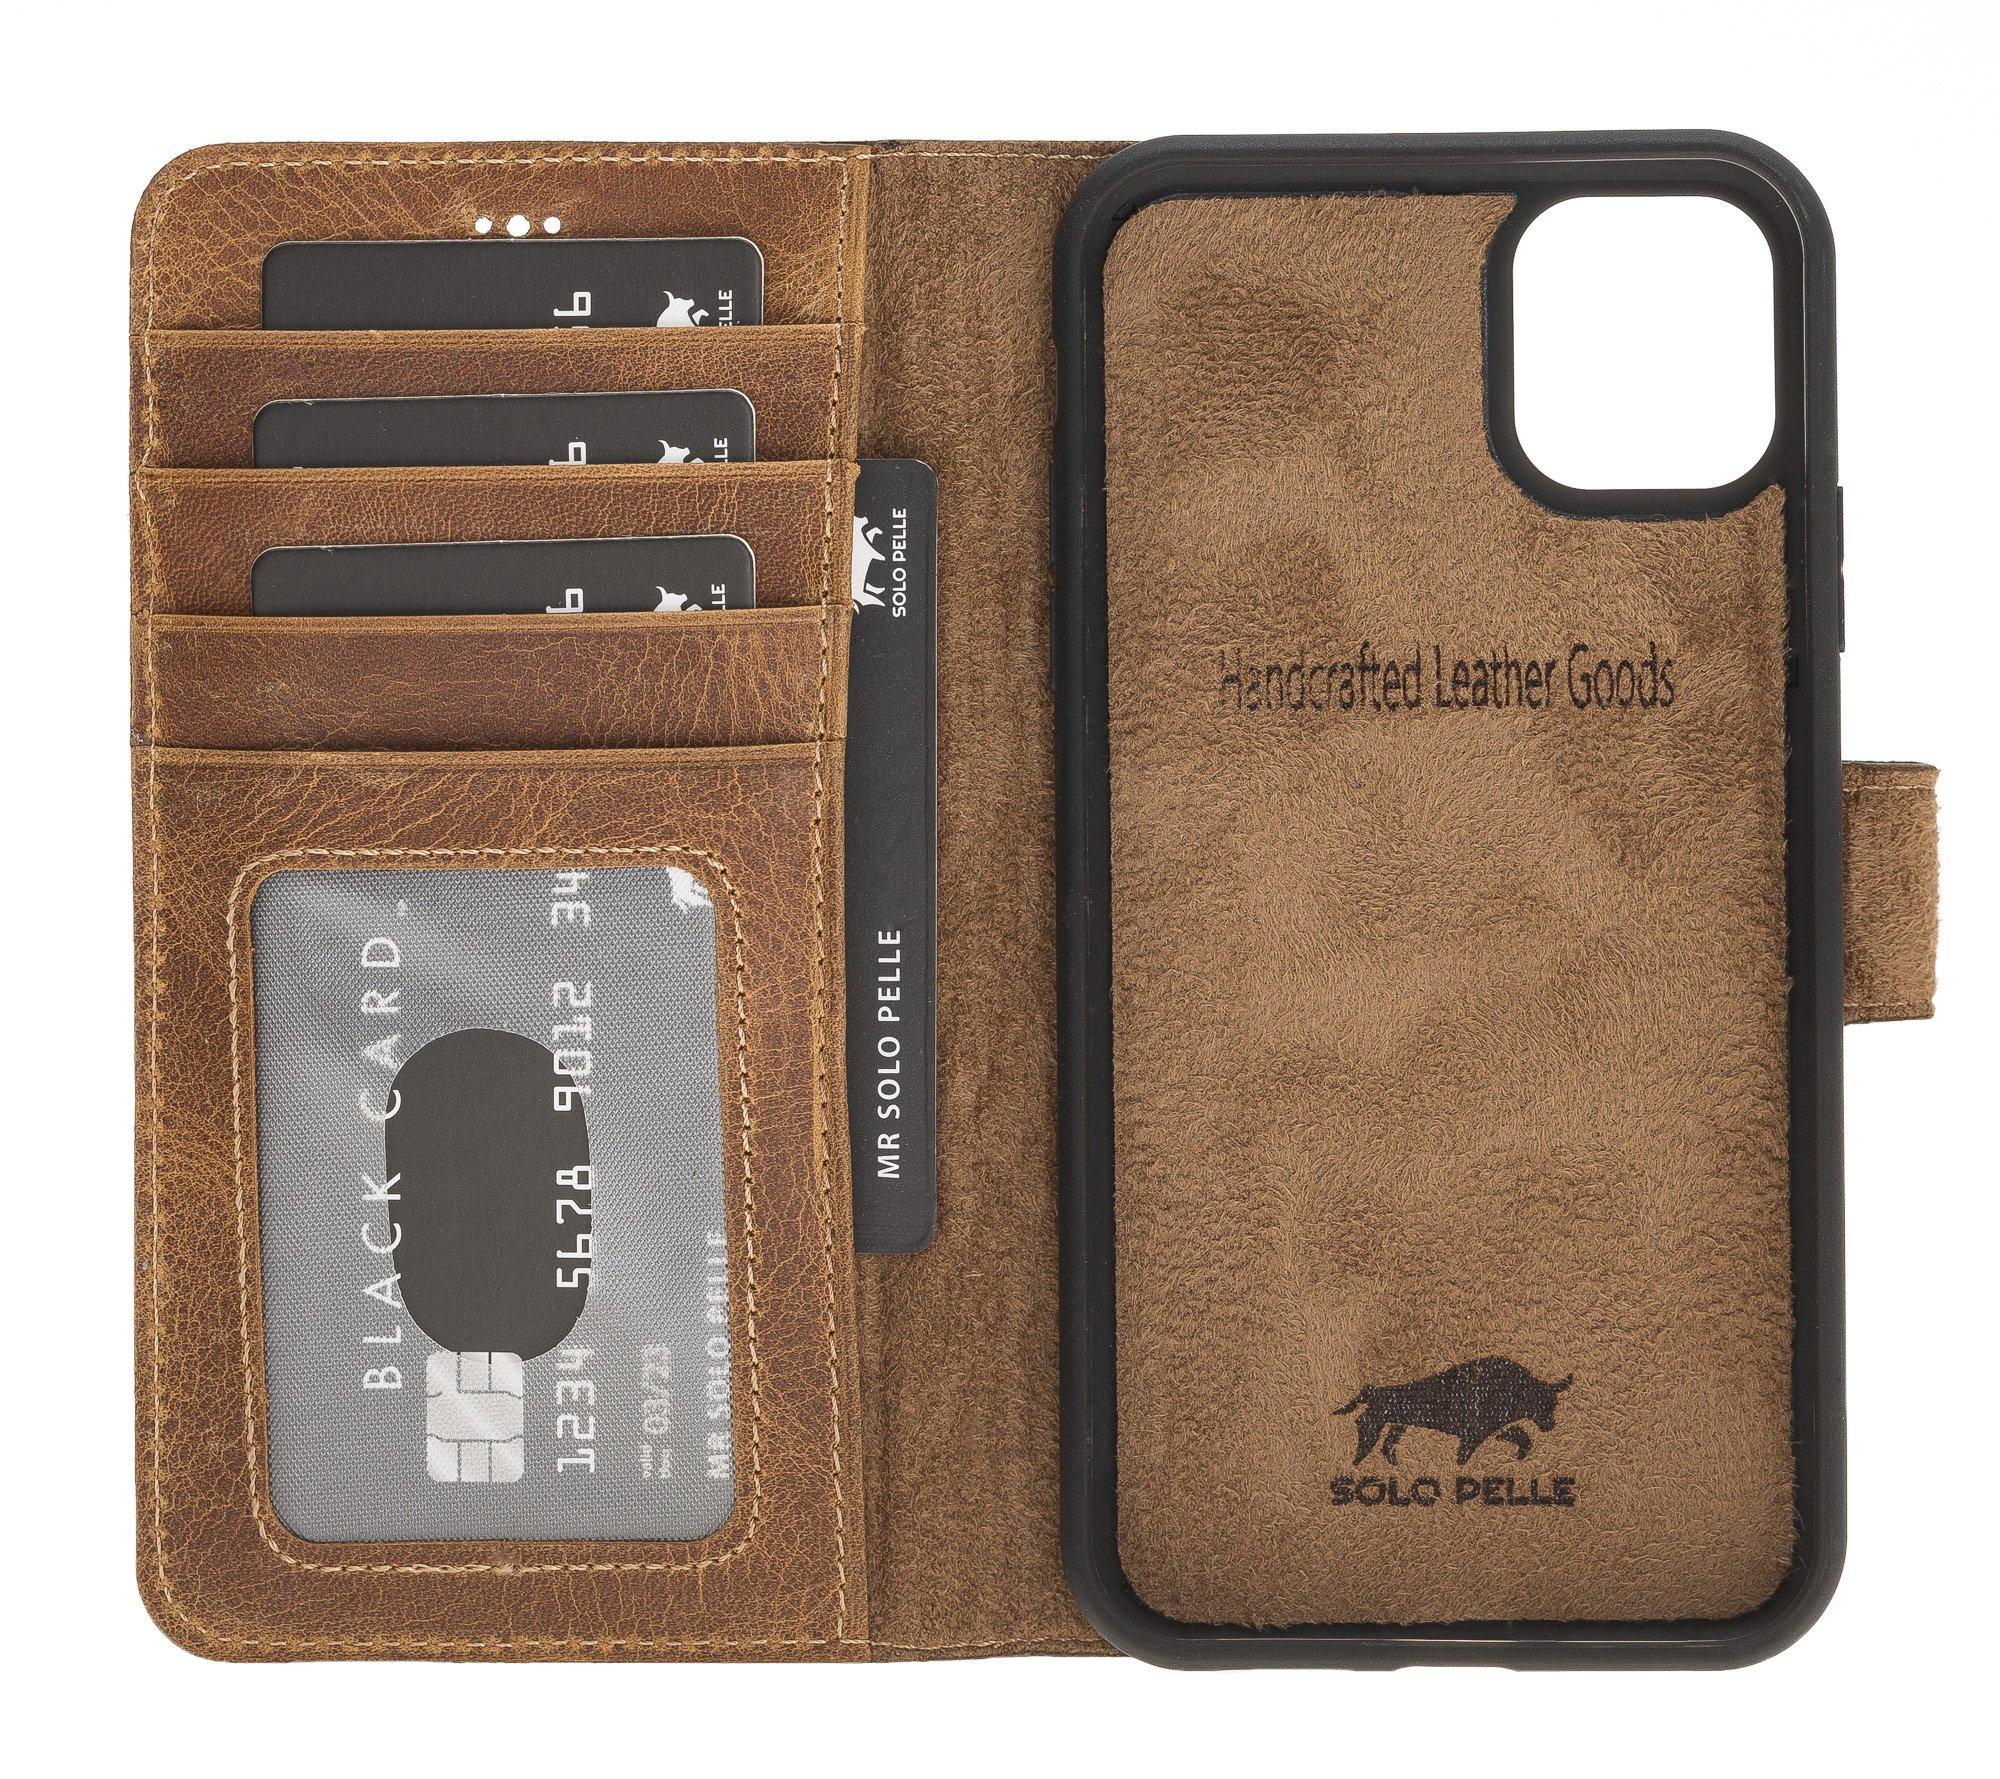 Solo Pelle Lederhülle kompatibel für iPhone 11 in 6.1 Zoll abnehmbare Hülle (2in1) inkl. Kartenfächer für das original Apple iPhone 11 (Camel Braun)